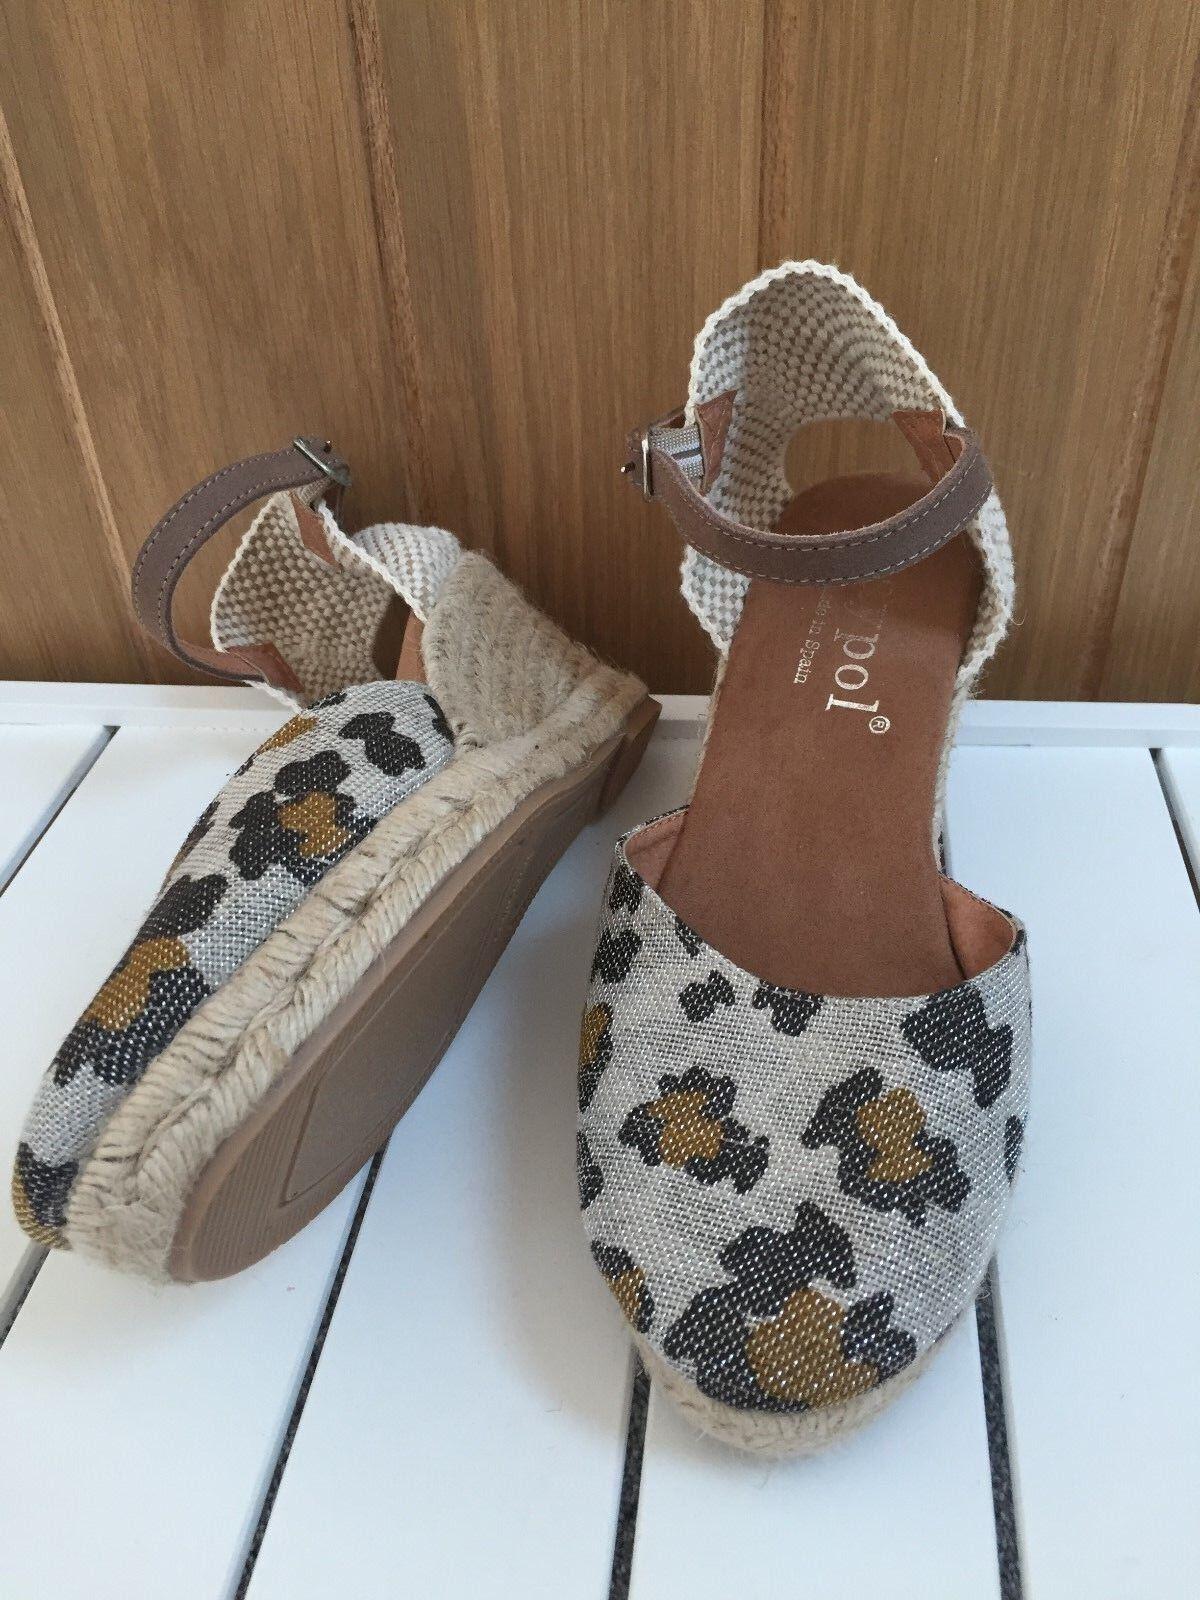 Maypol Spain Beige Leopard animal print Espadrille Wedge shoes –  UK 6 EU 39 NEW